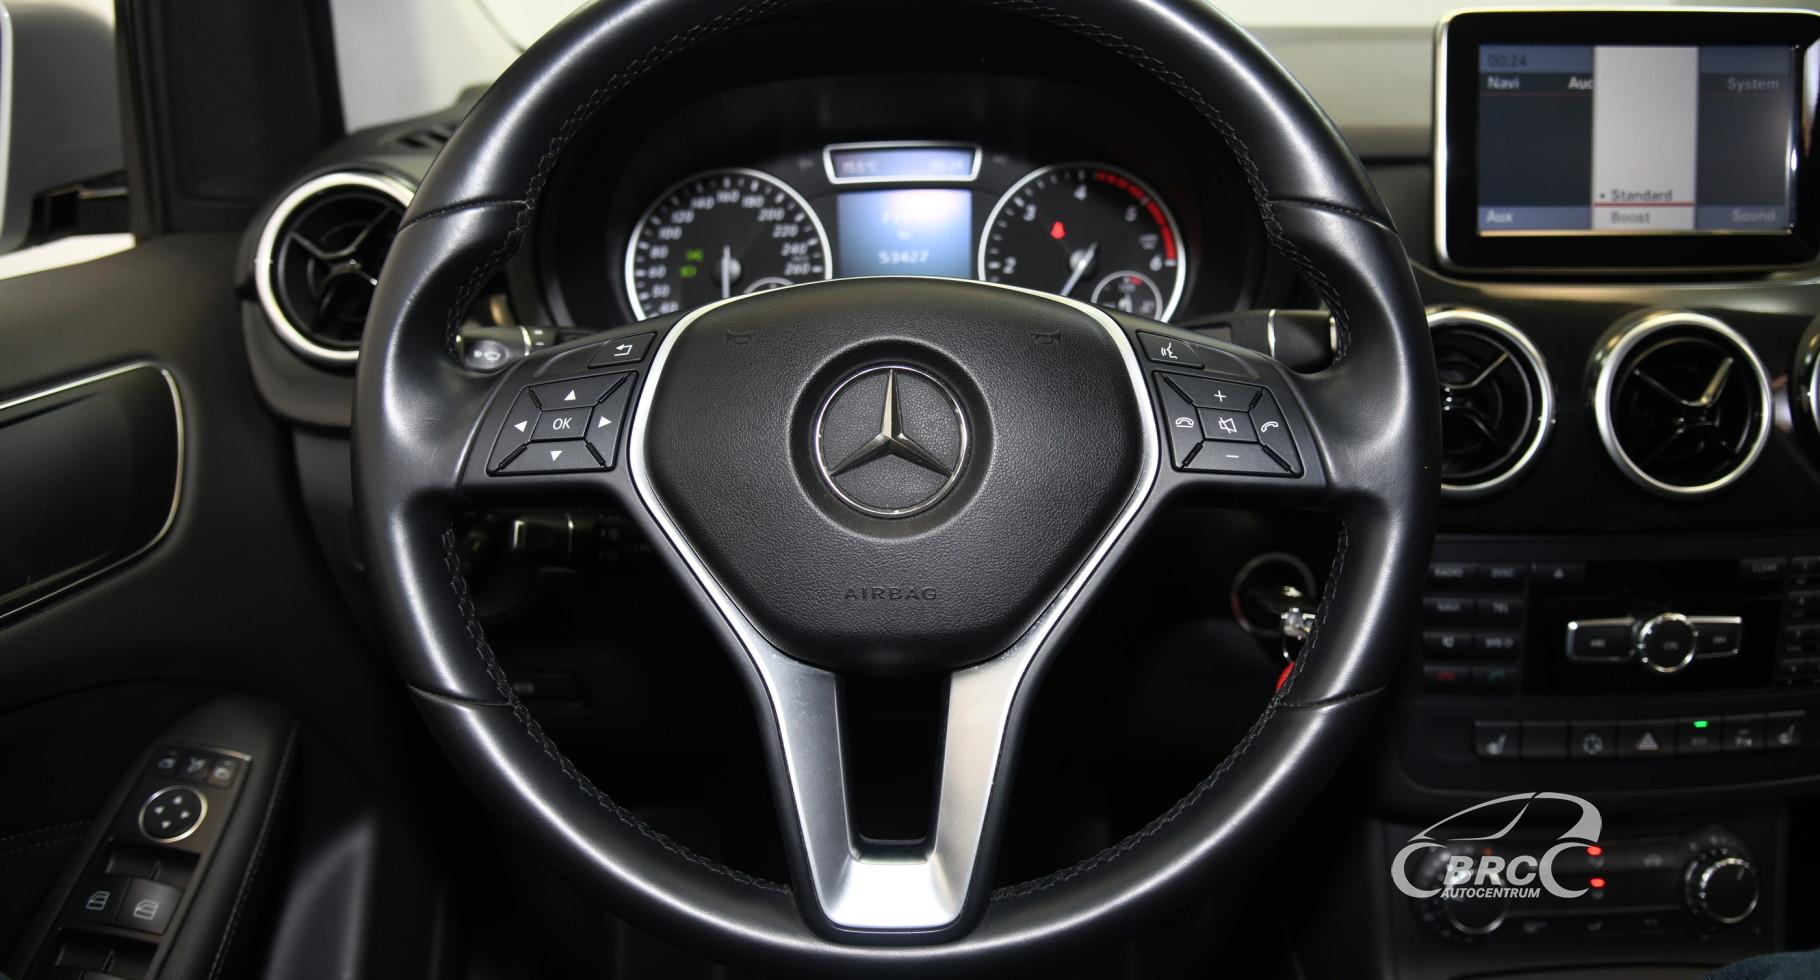 Mercedes-Benz B 200 CDI Automatas